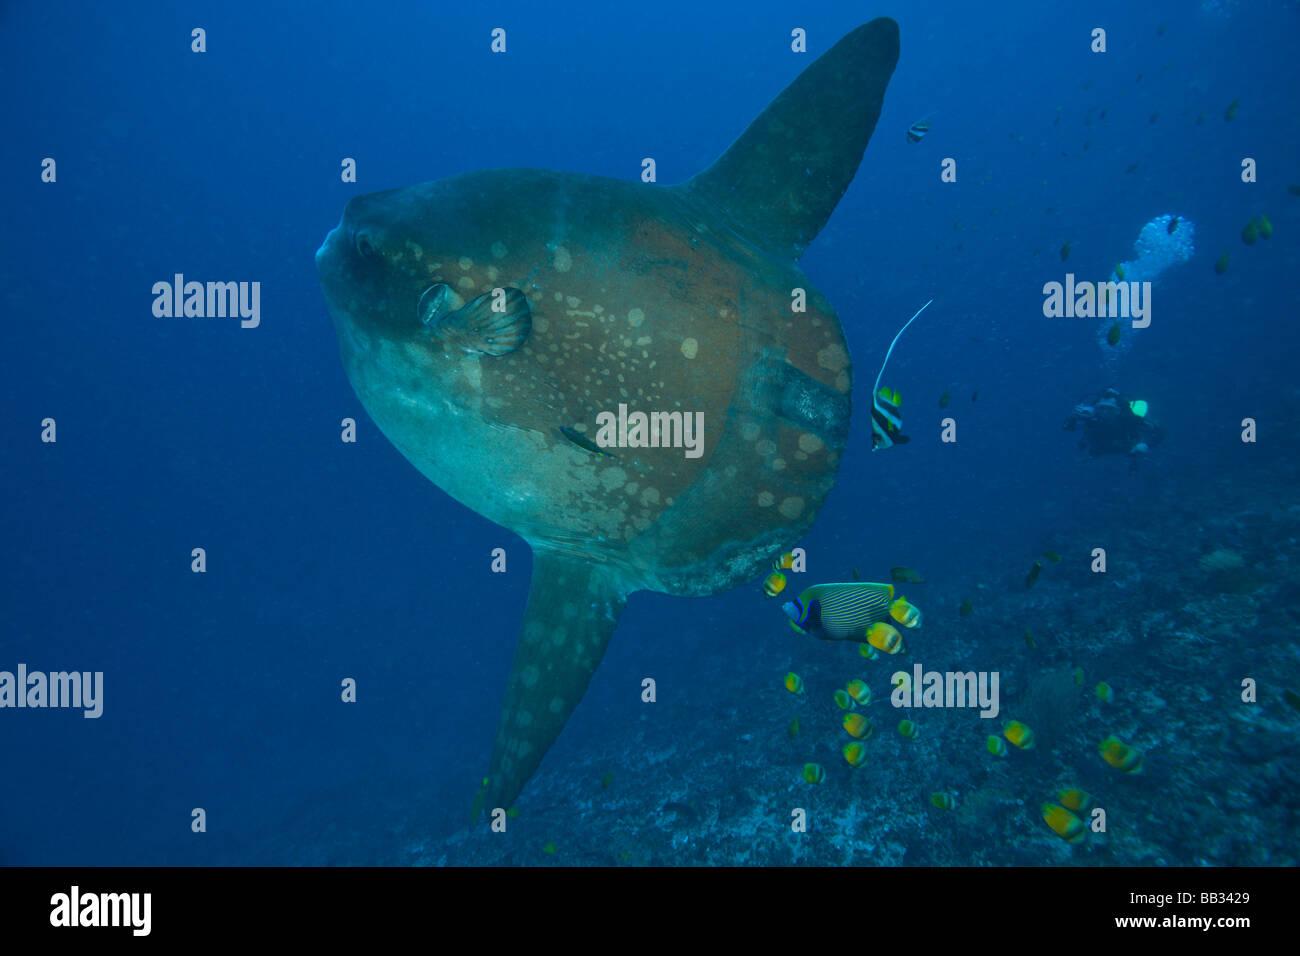 Mola Mola Fish Diver Photos Mola Mola Fish Diver Images Alamy